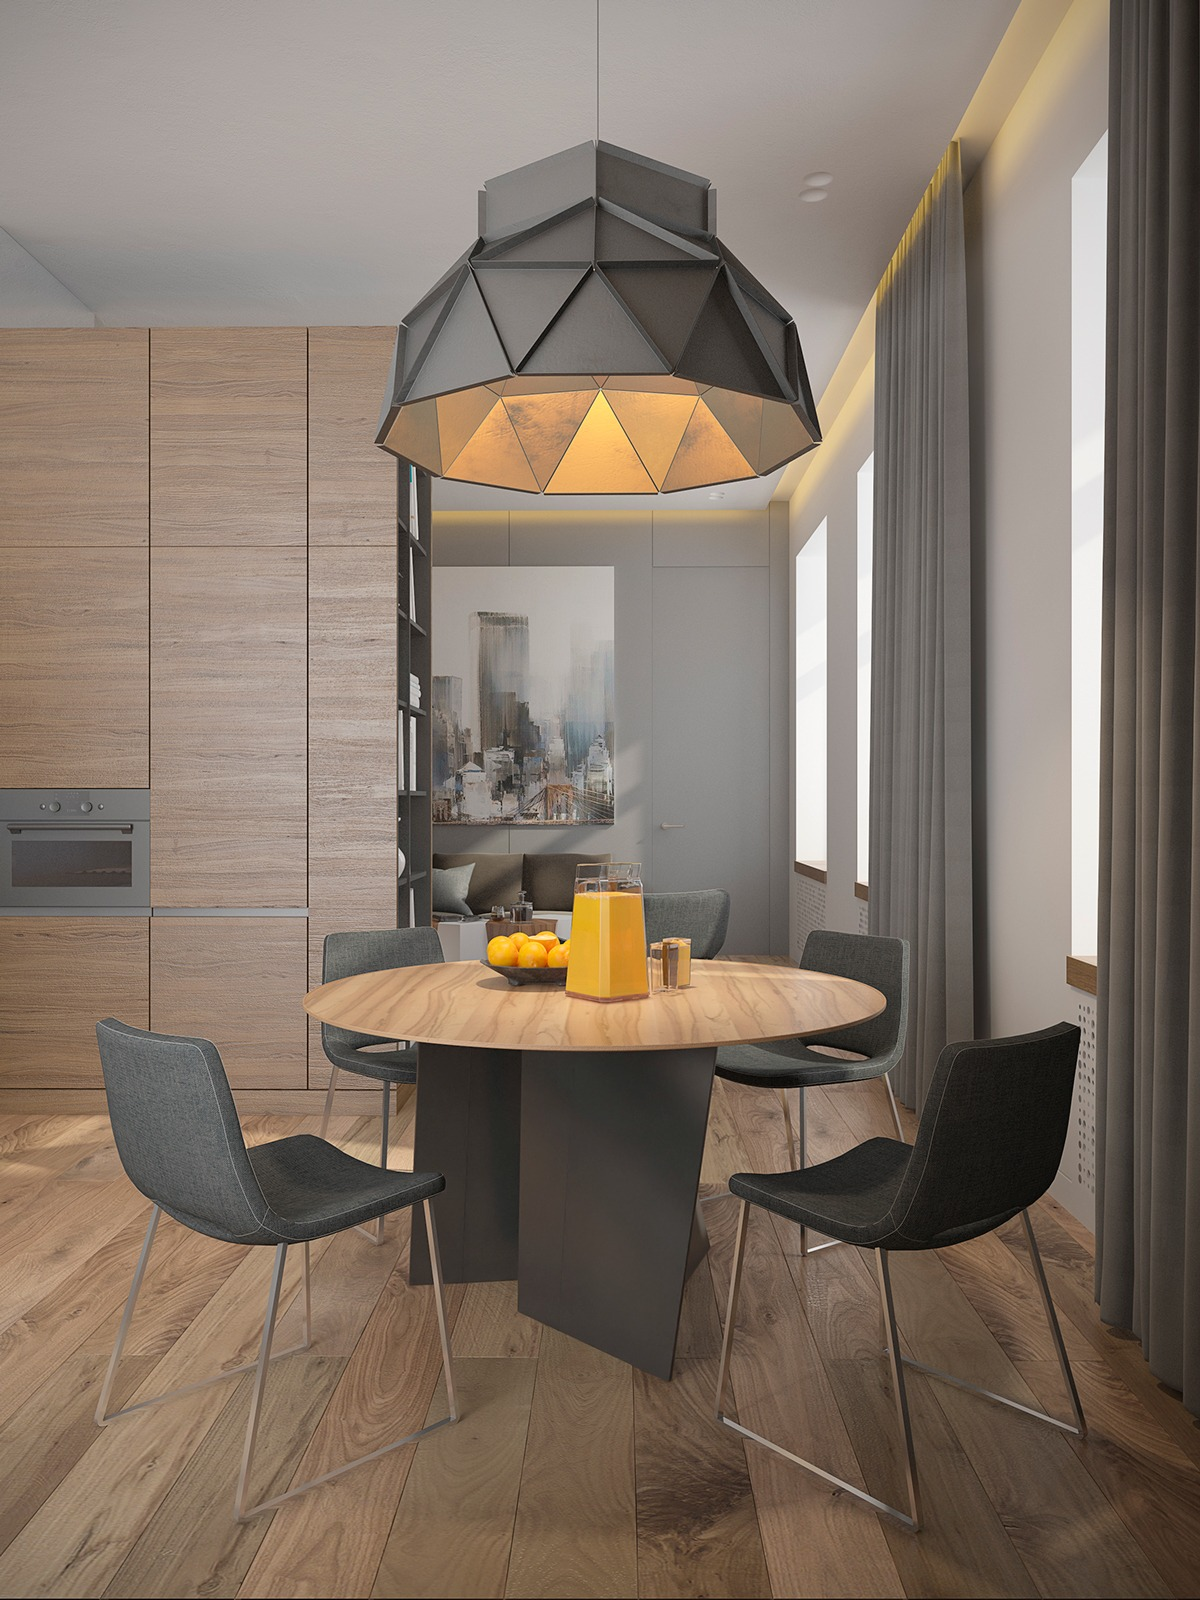 3 One Bedroom Homes With Sharp Geometric Decor